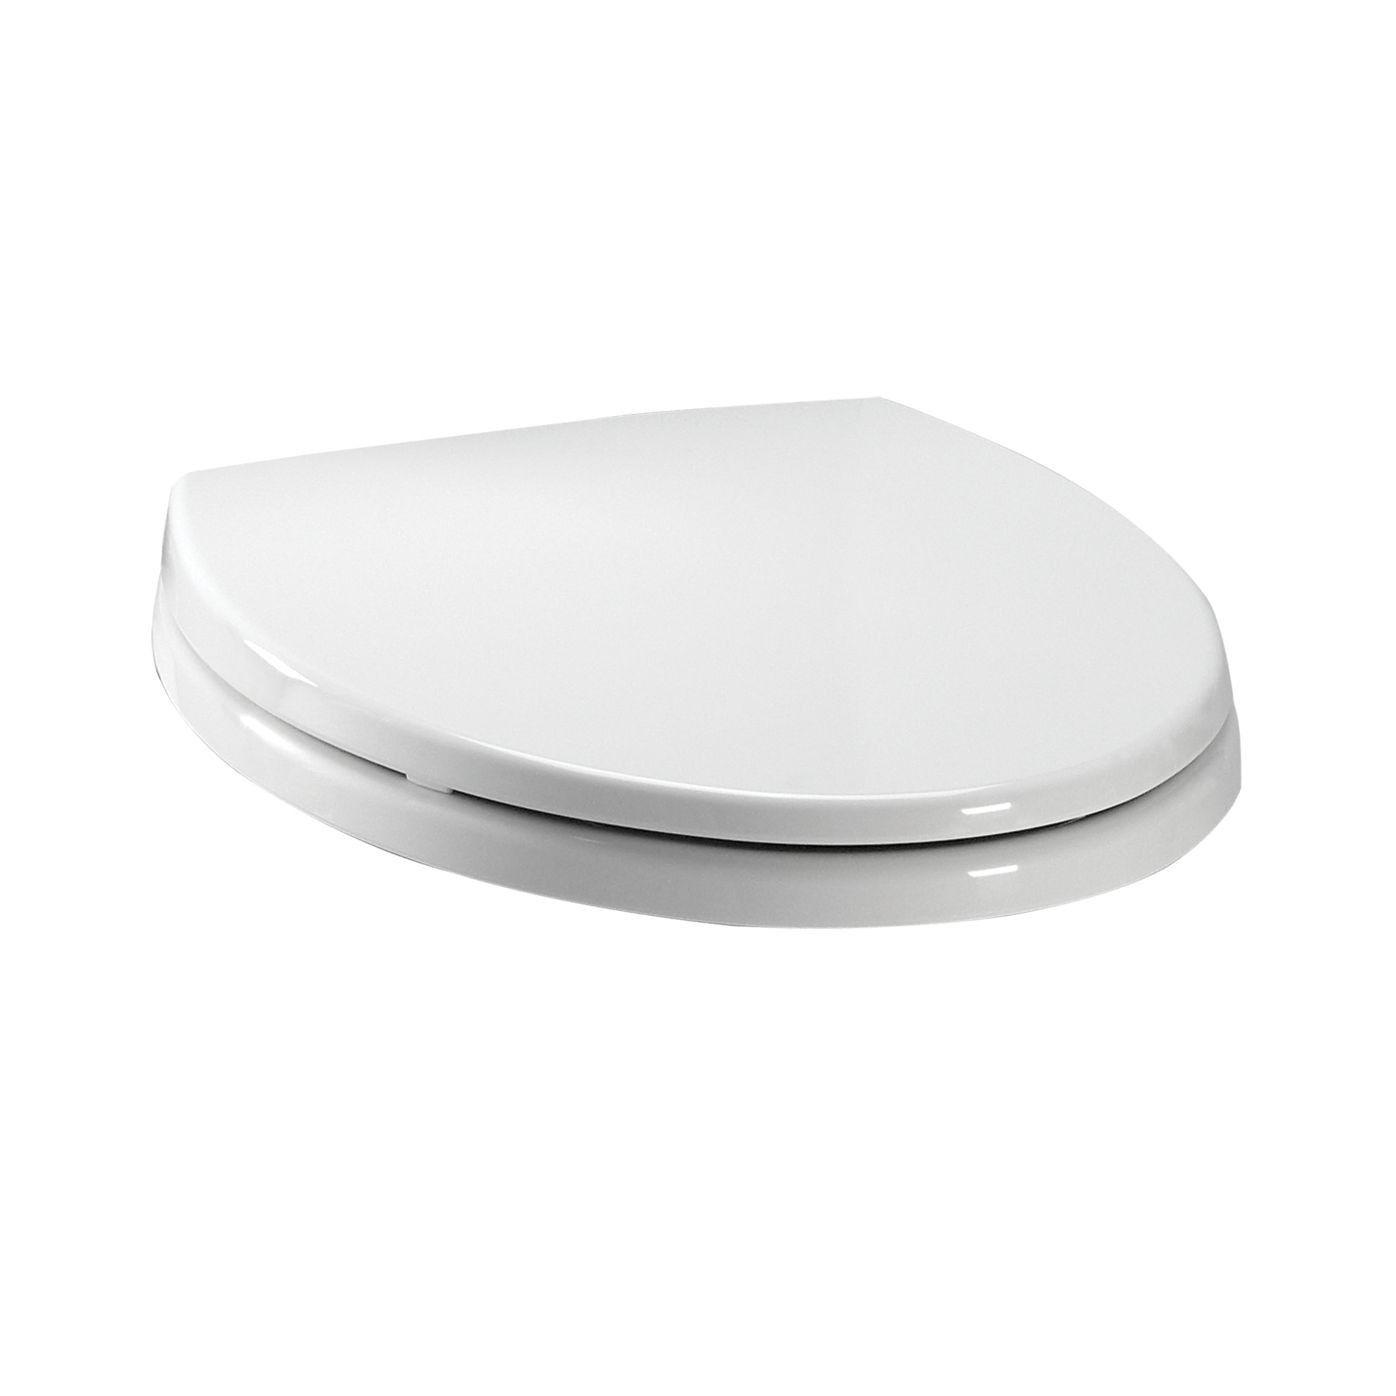 TOTO SS114#01 SoftClose Toilet Seat - Elongated | Cotton/White ...